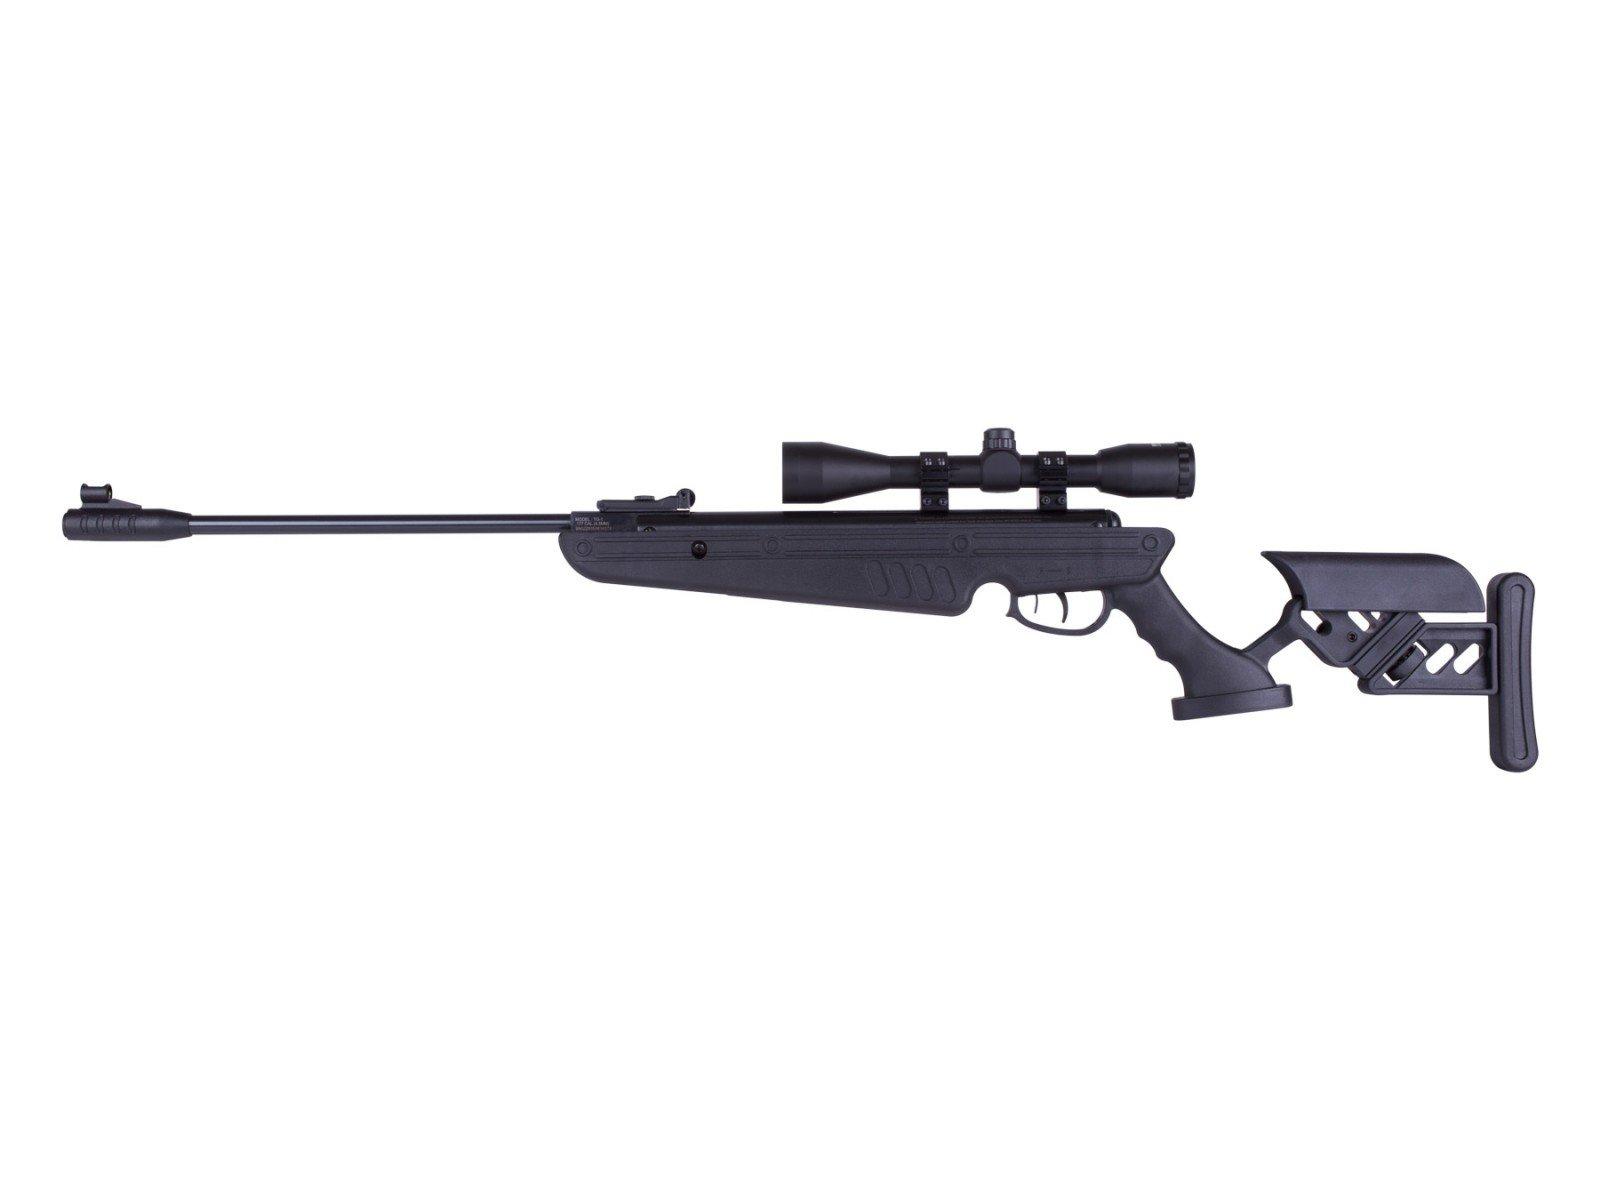 Swiss Arms TG-1, black